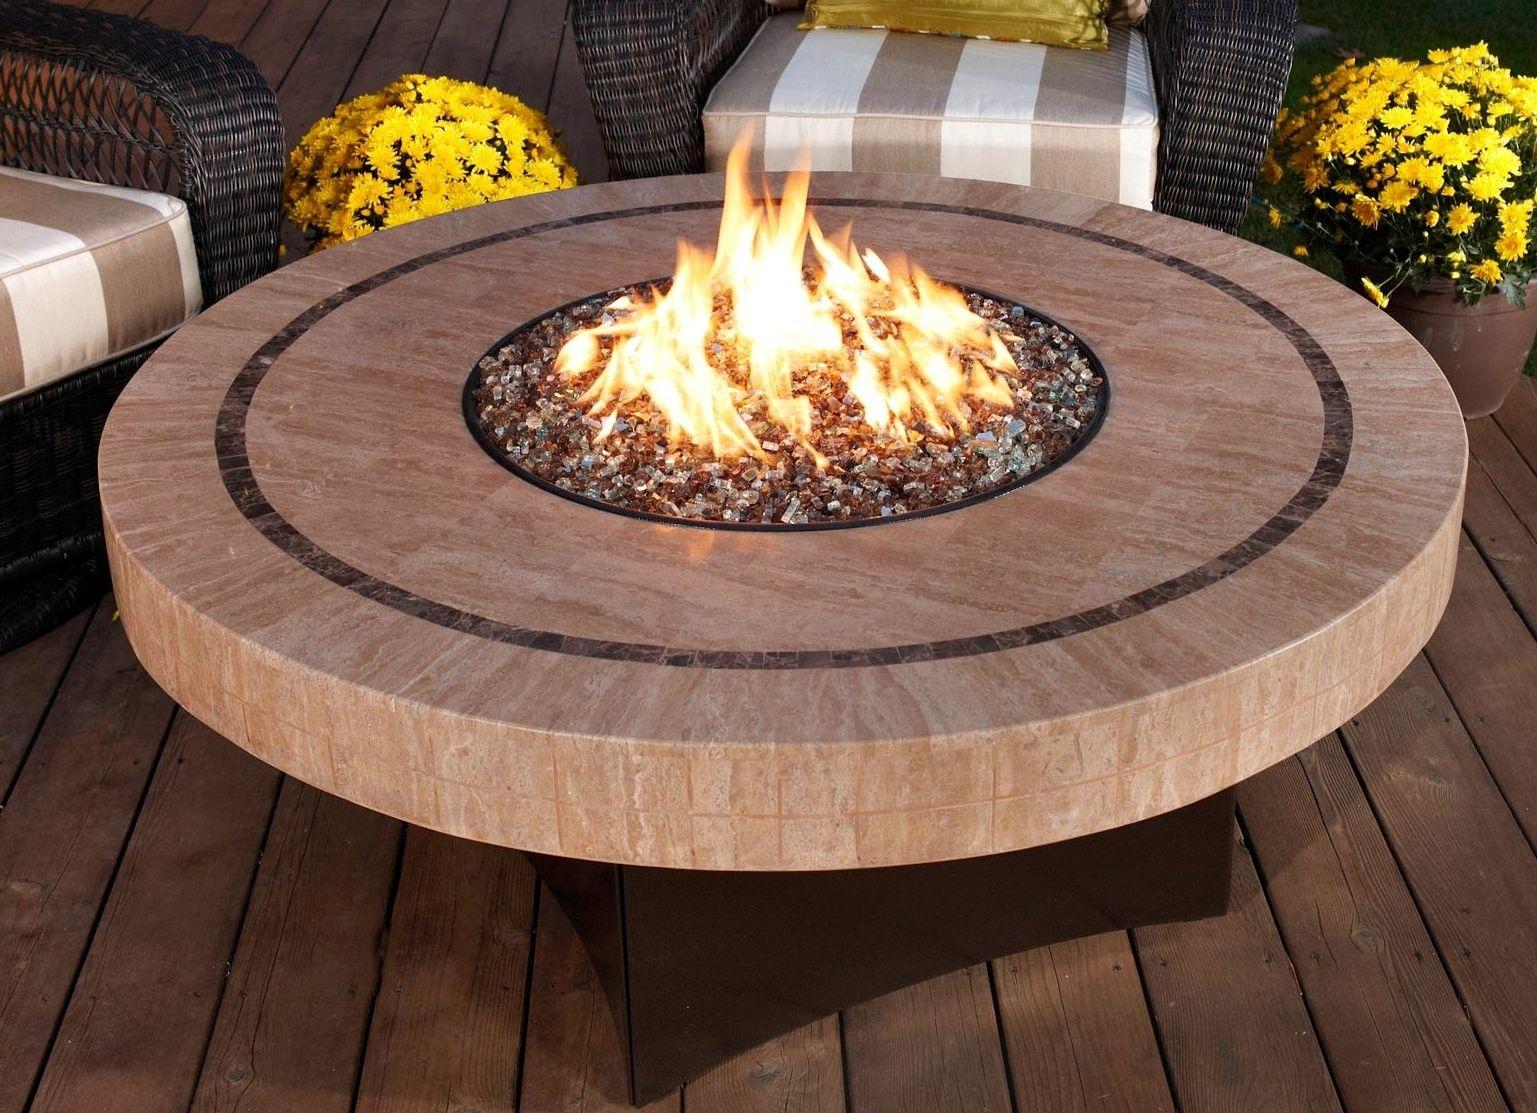 Diy fire pit kit architecture interior furniture square